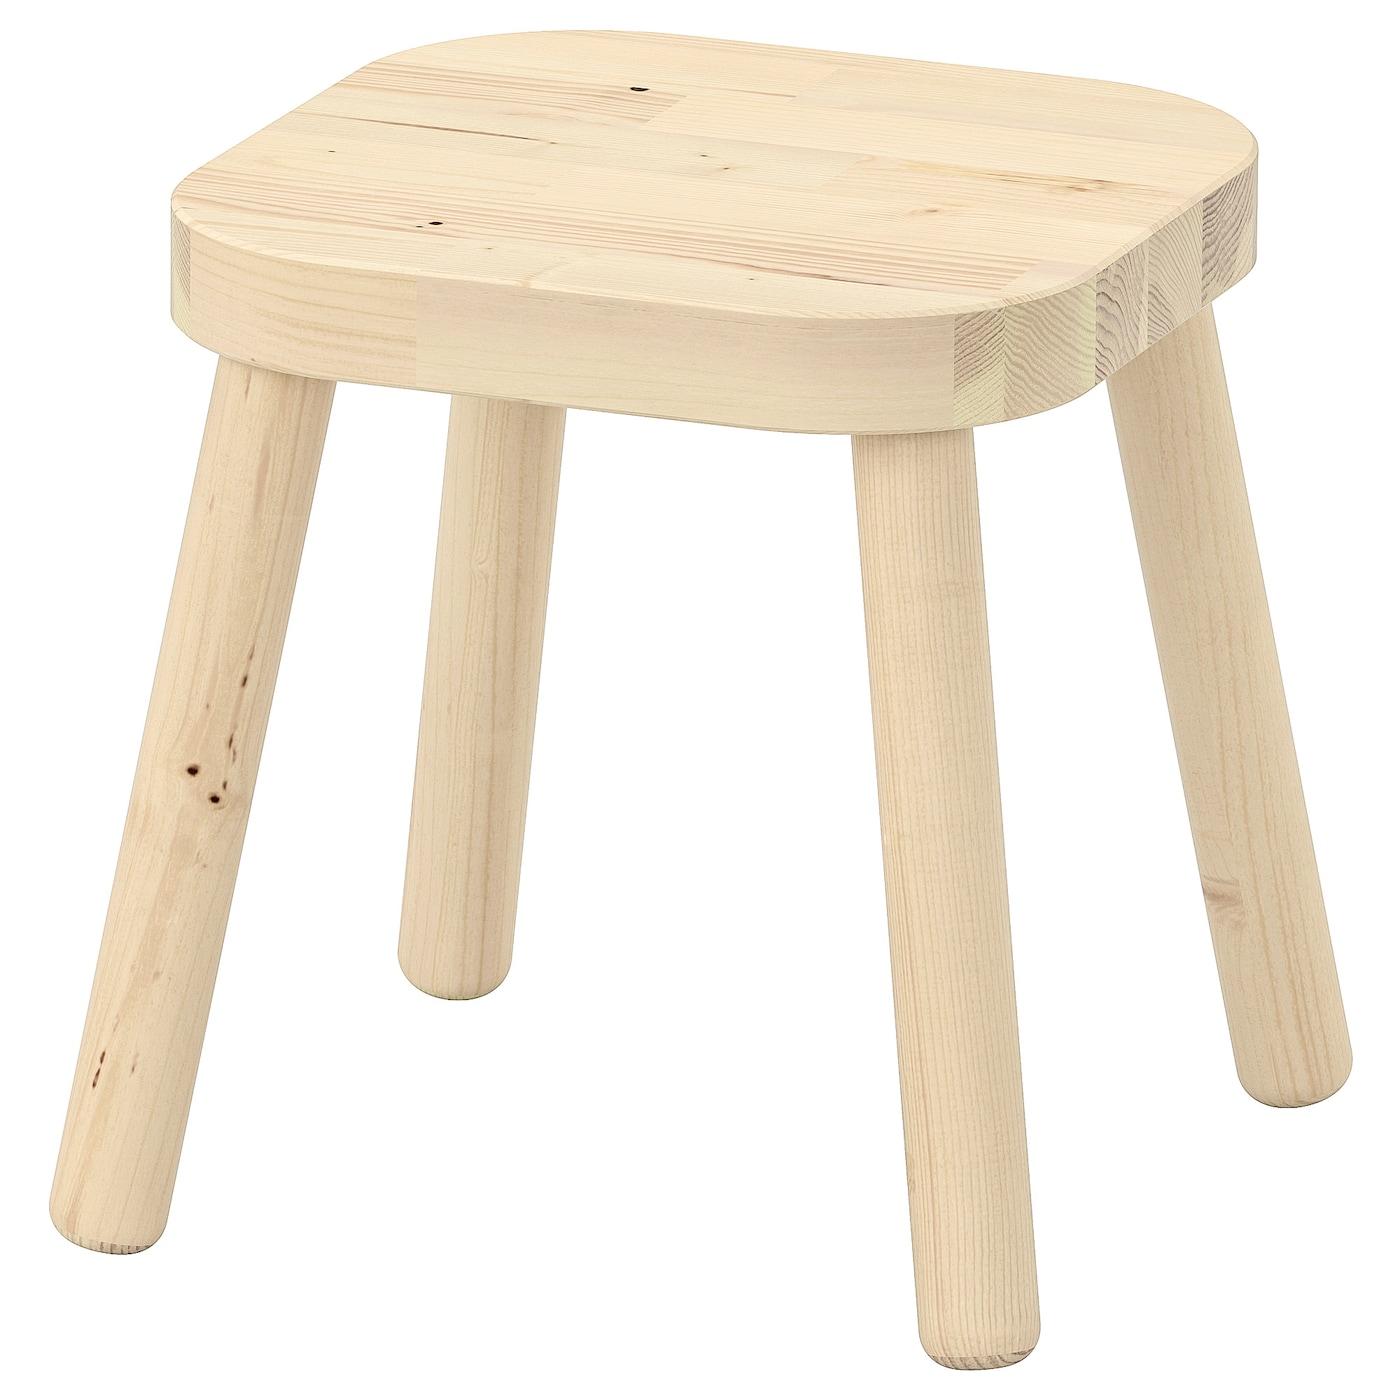 Picture of: Flisat Children S Stool 9 1 2×9 1 2×11 Ikea